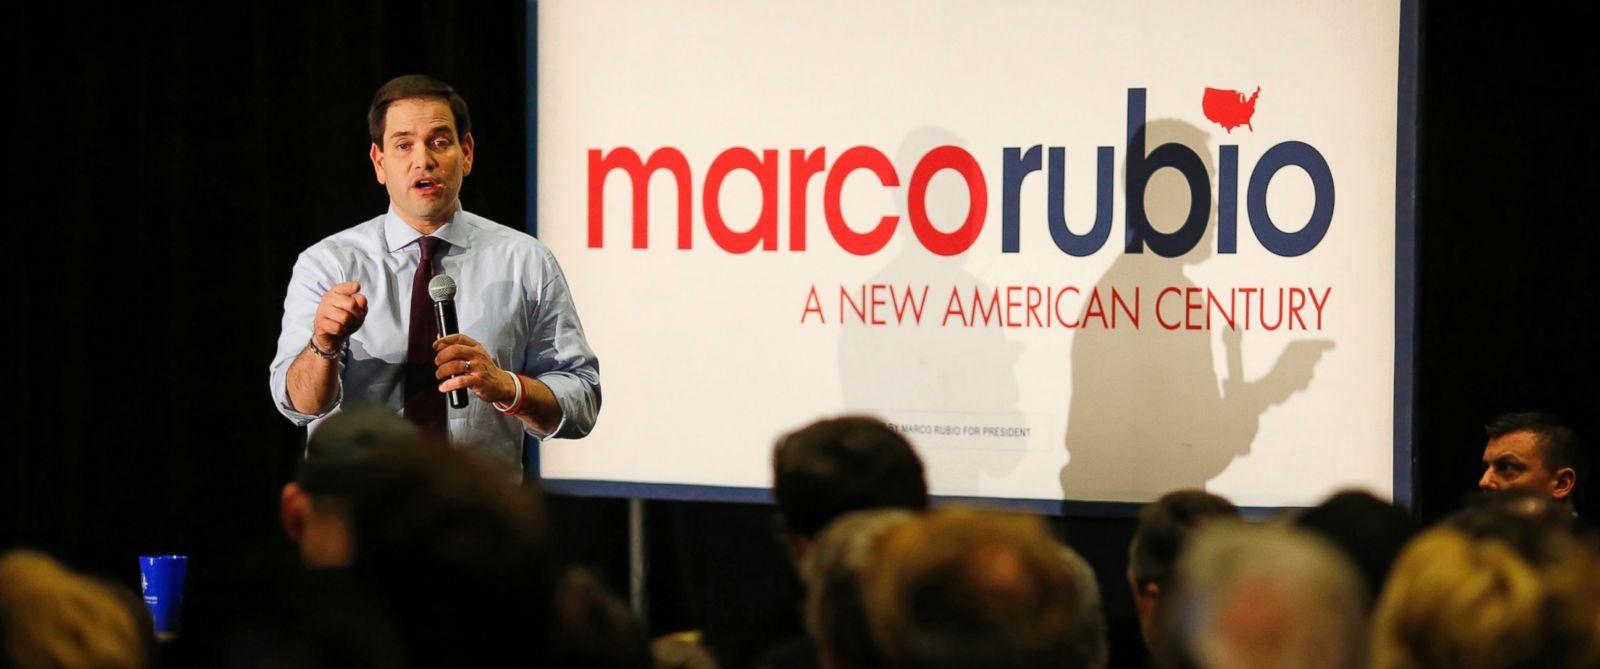 PHOTO: Republican presidential candidate Marco Rubio speaks at St. Ambrose University in Davenport, Iowa, Jan. 31, 2016.